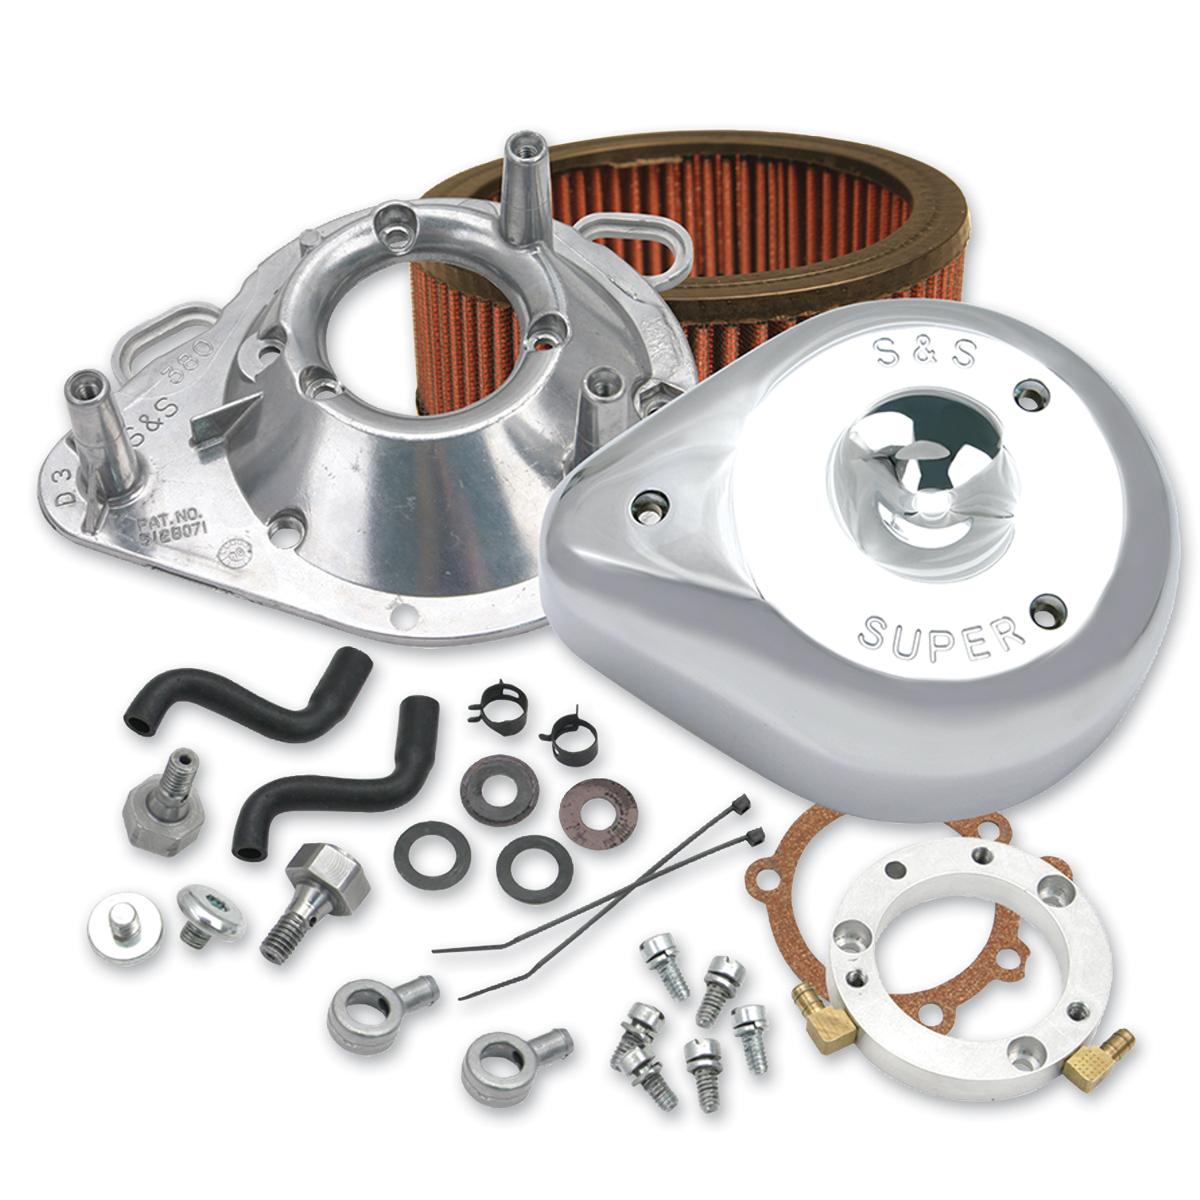 S&S Cycle Teardrop Air Cleaner Kit Chrome